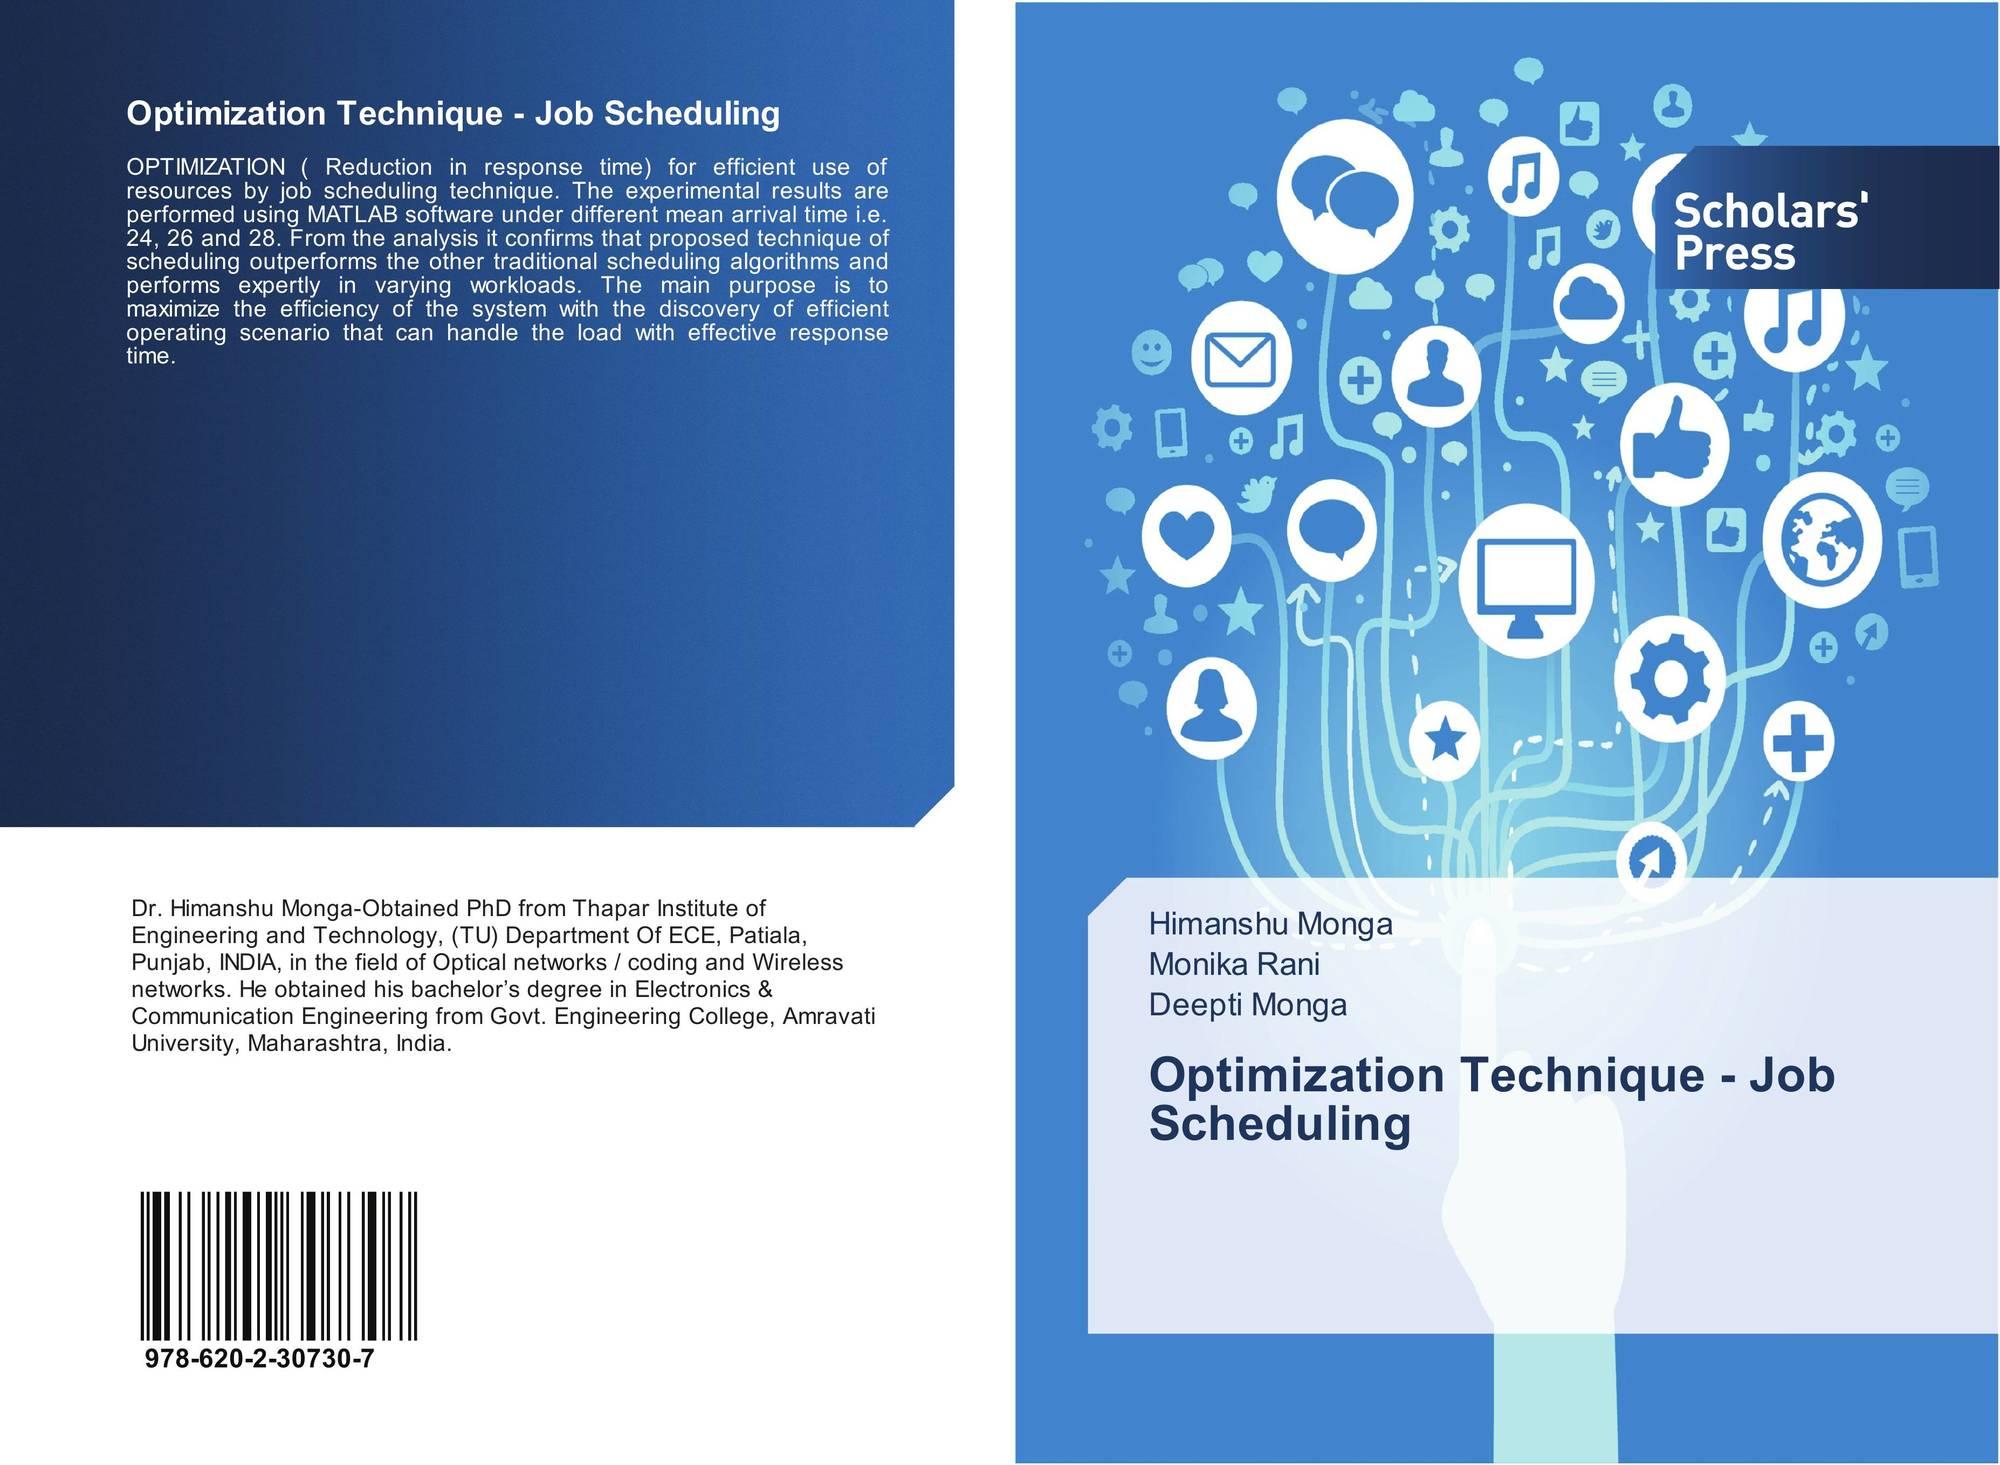 Optimization Technique - Job Scheduling, 978-620-2-30730-7